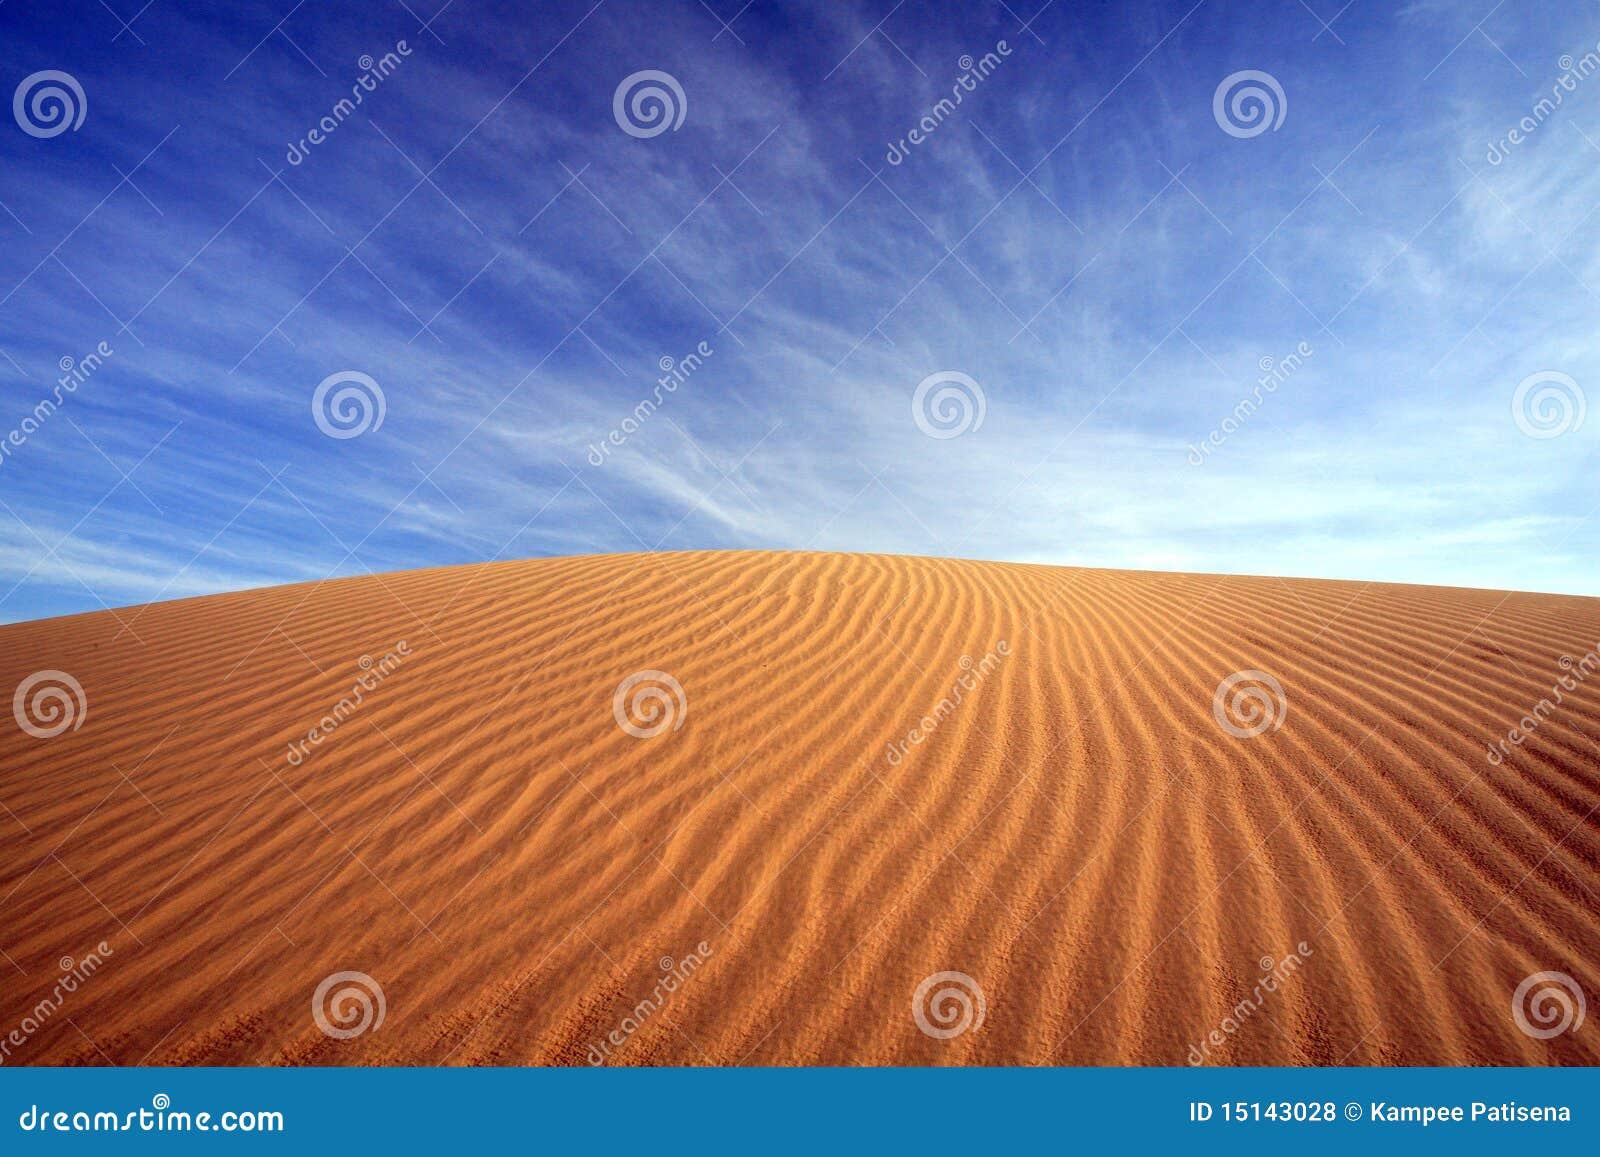 Dynindia sand